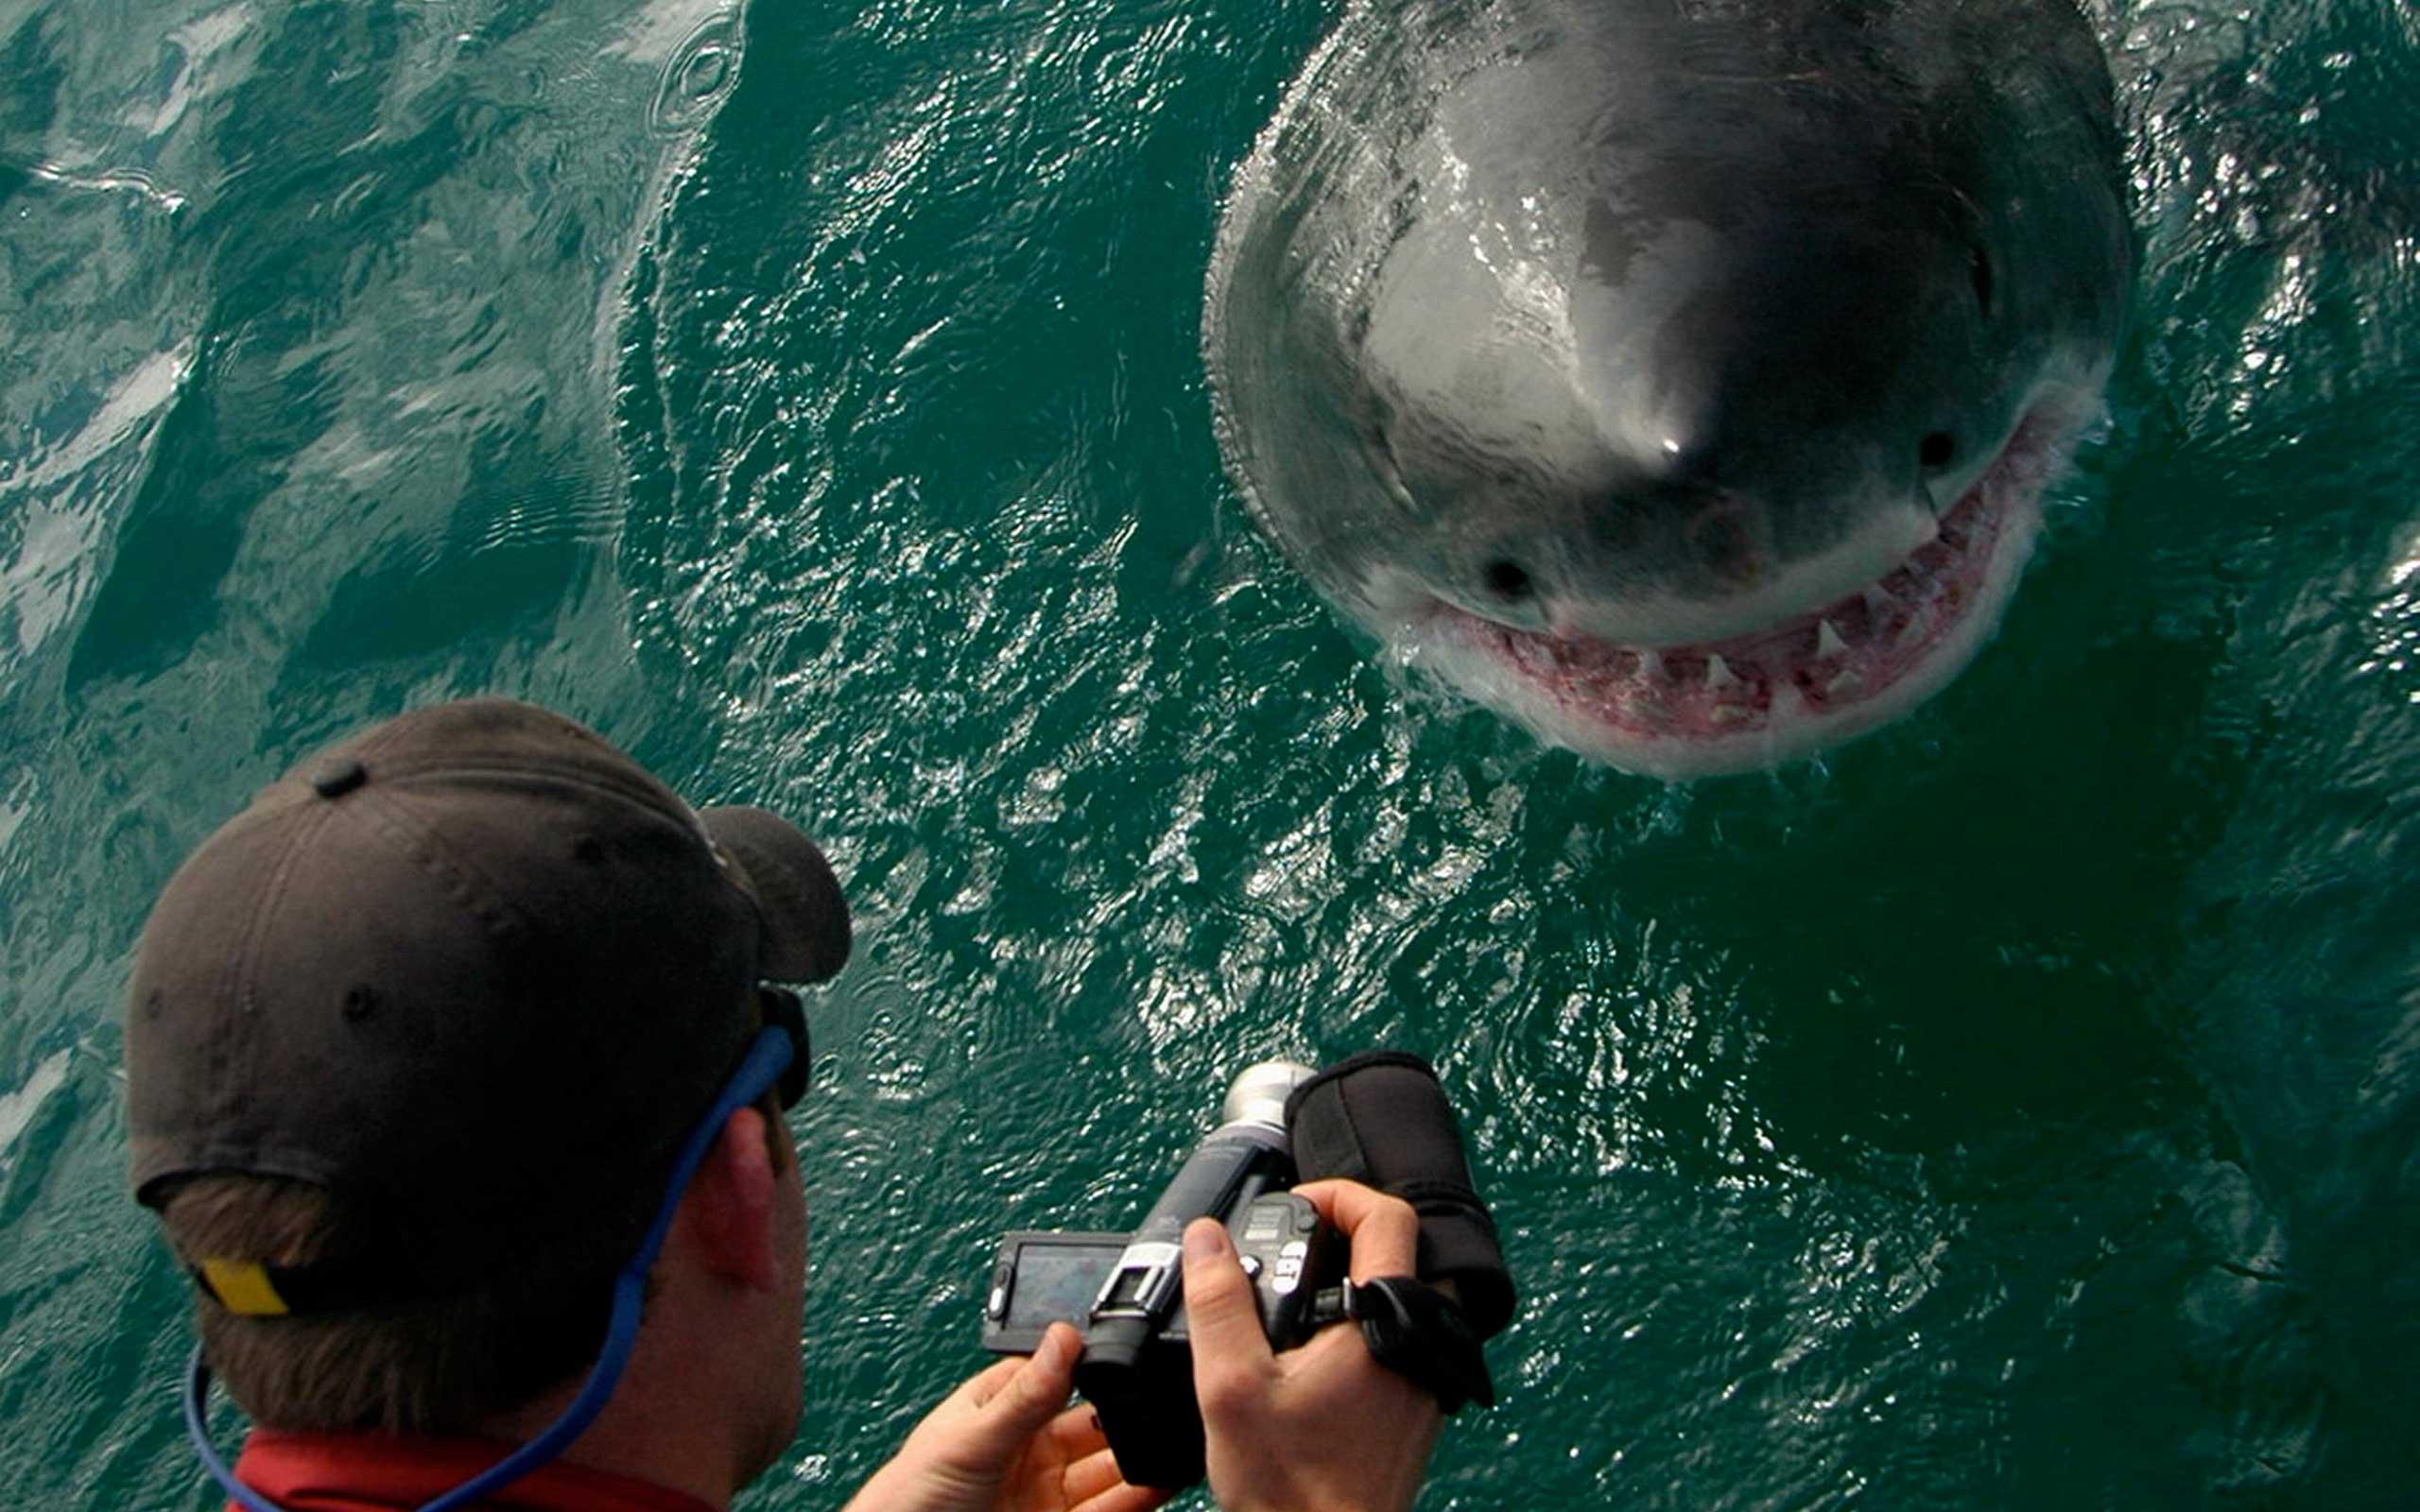 grootbos-great-white-shark-south-africa-enkosi